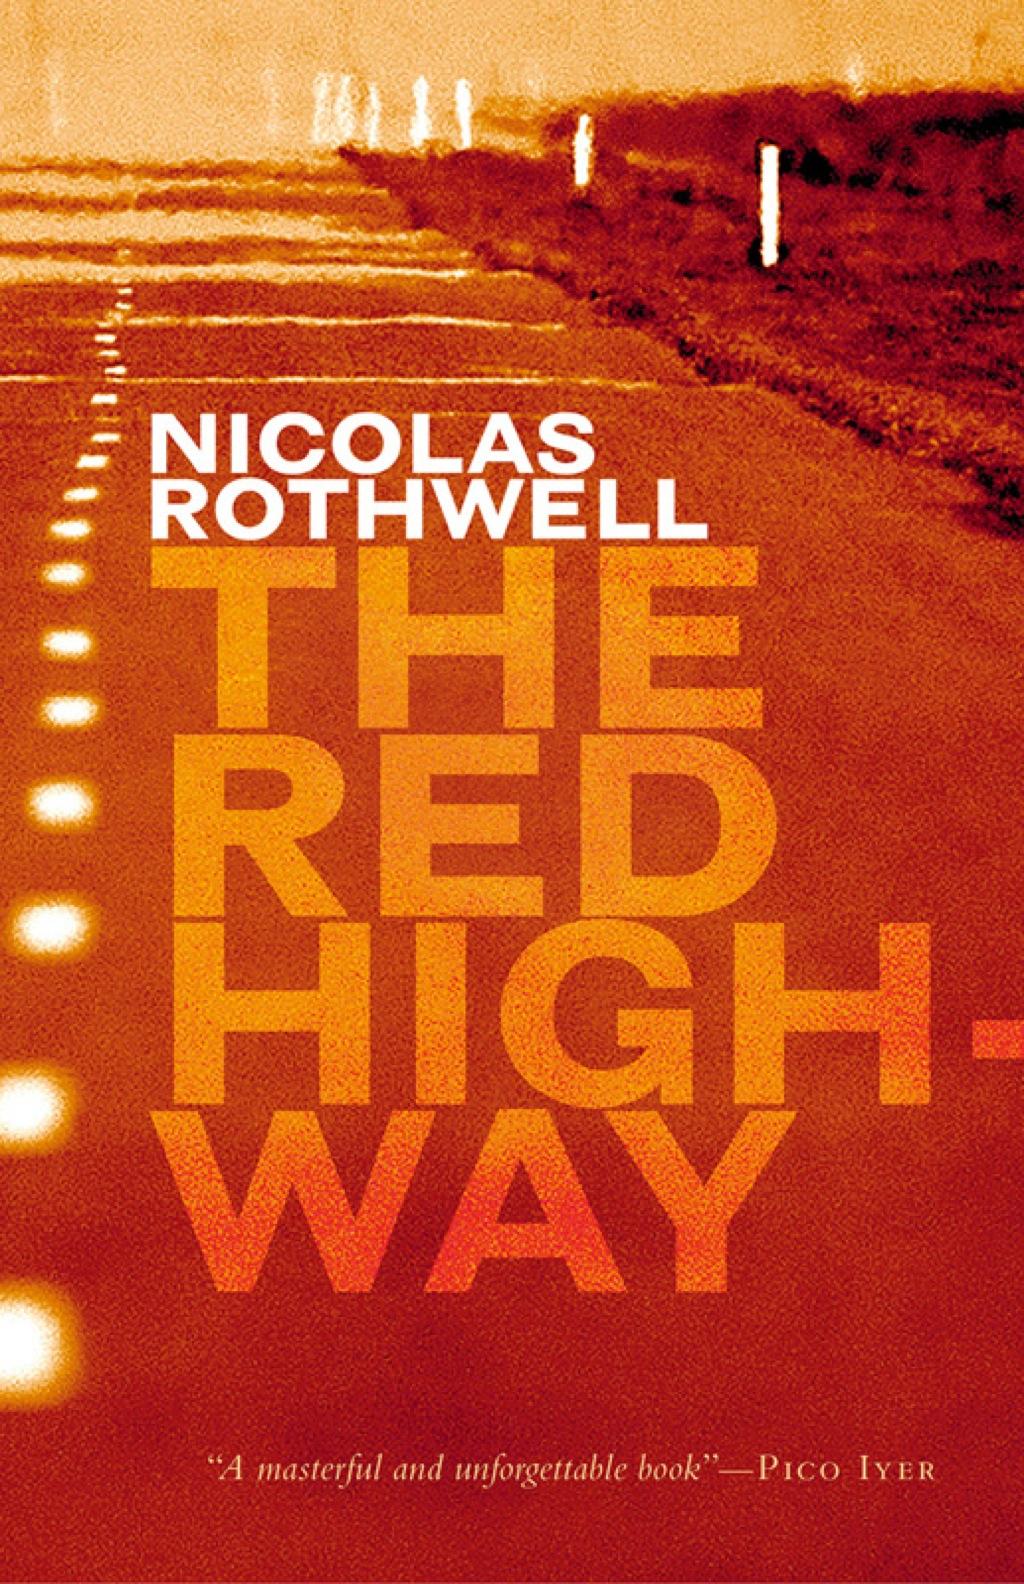 By Nicolas Rothwell PRINTISBN: 9781863954938 E-TEXT ISBN: 9781921825521 Edition: 0